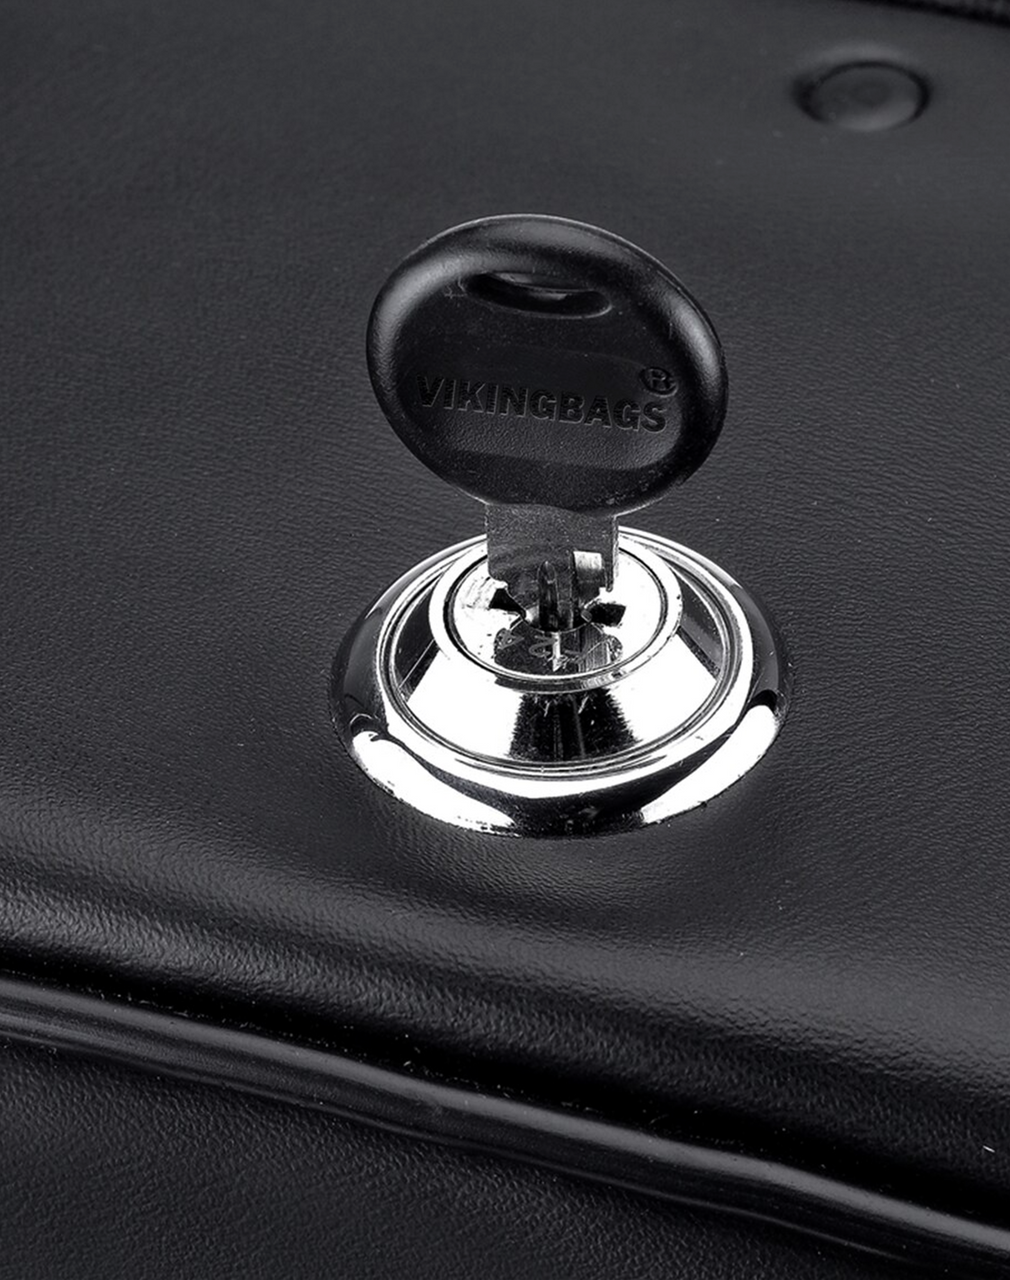 Honda VTX 1800 S SS Shock Cutout Slant Studded Large Motorcycle Saddlebags lock key view